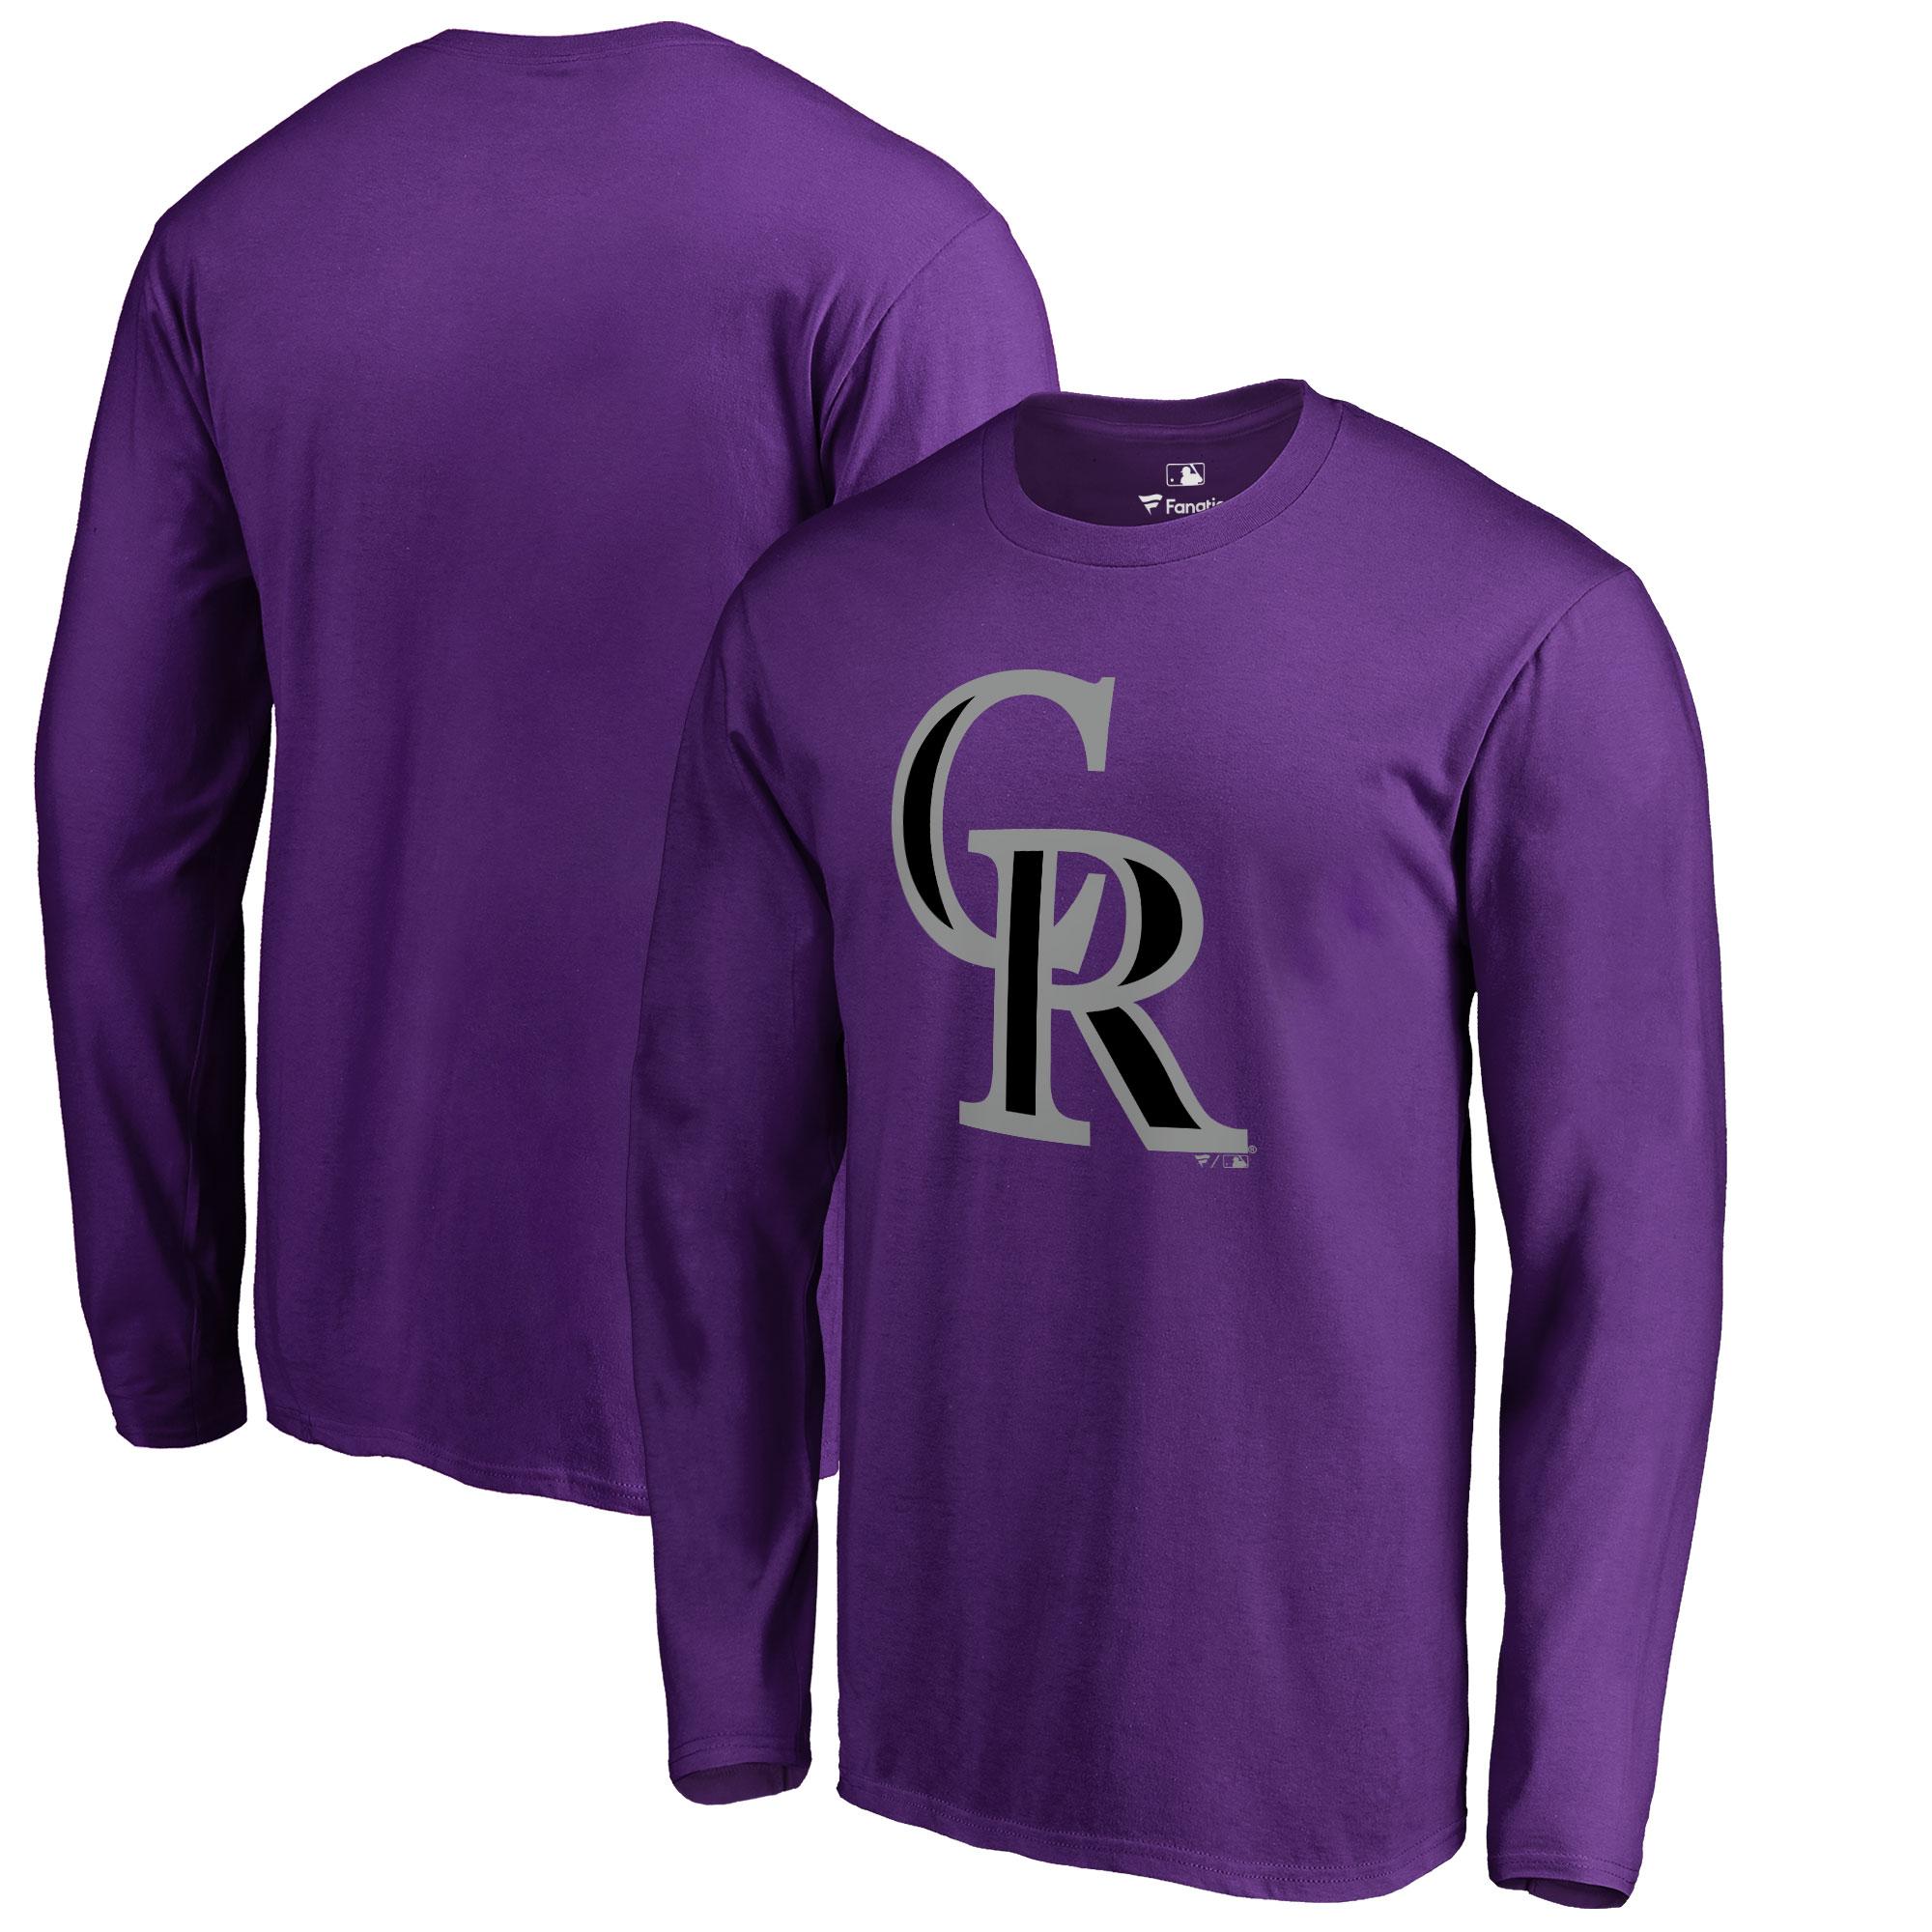 Colorado Rockies Big & Tall Primary Team Logo Long Sleeve T-Shirt - Purple